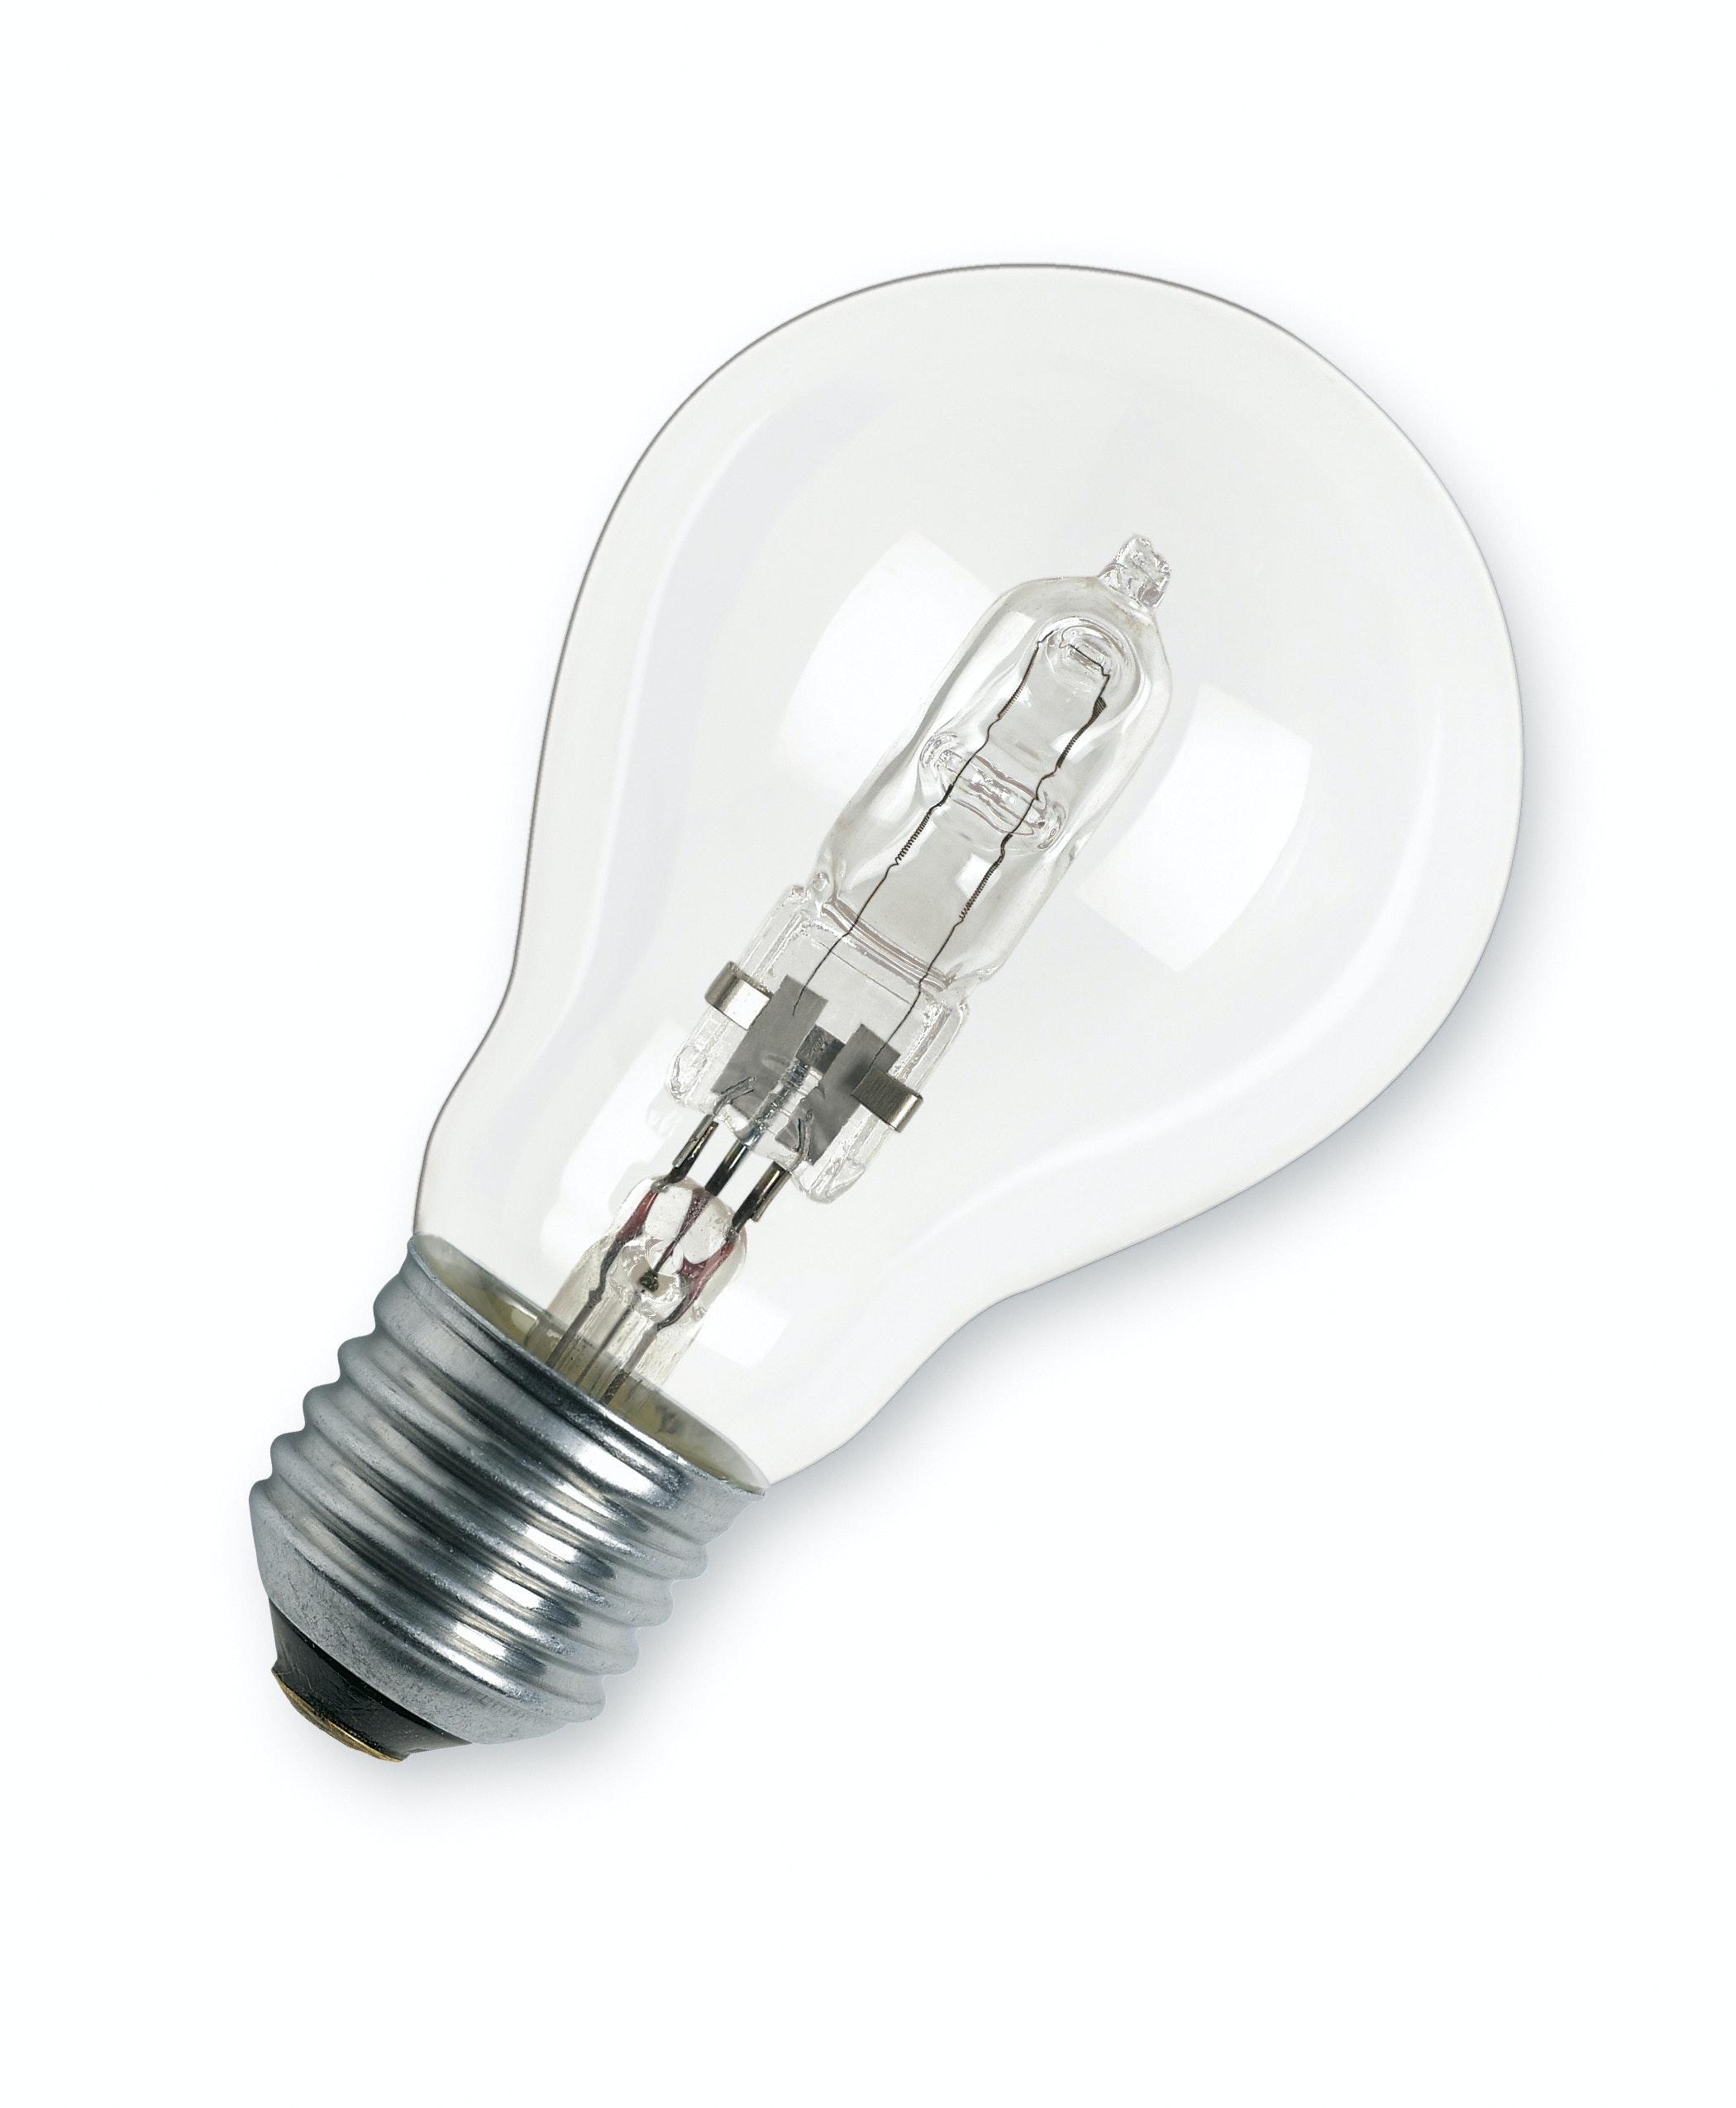 Halogenlampa Osram E27 116W Dimbar